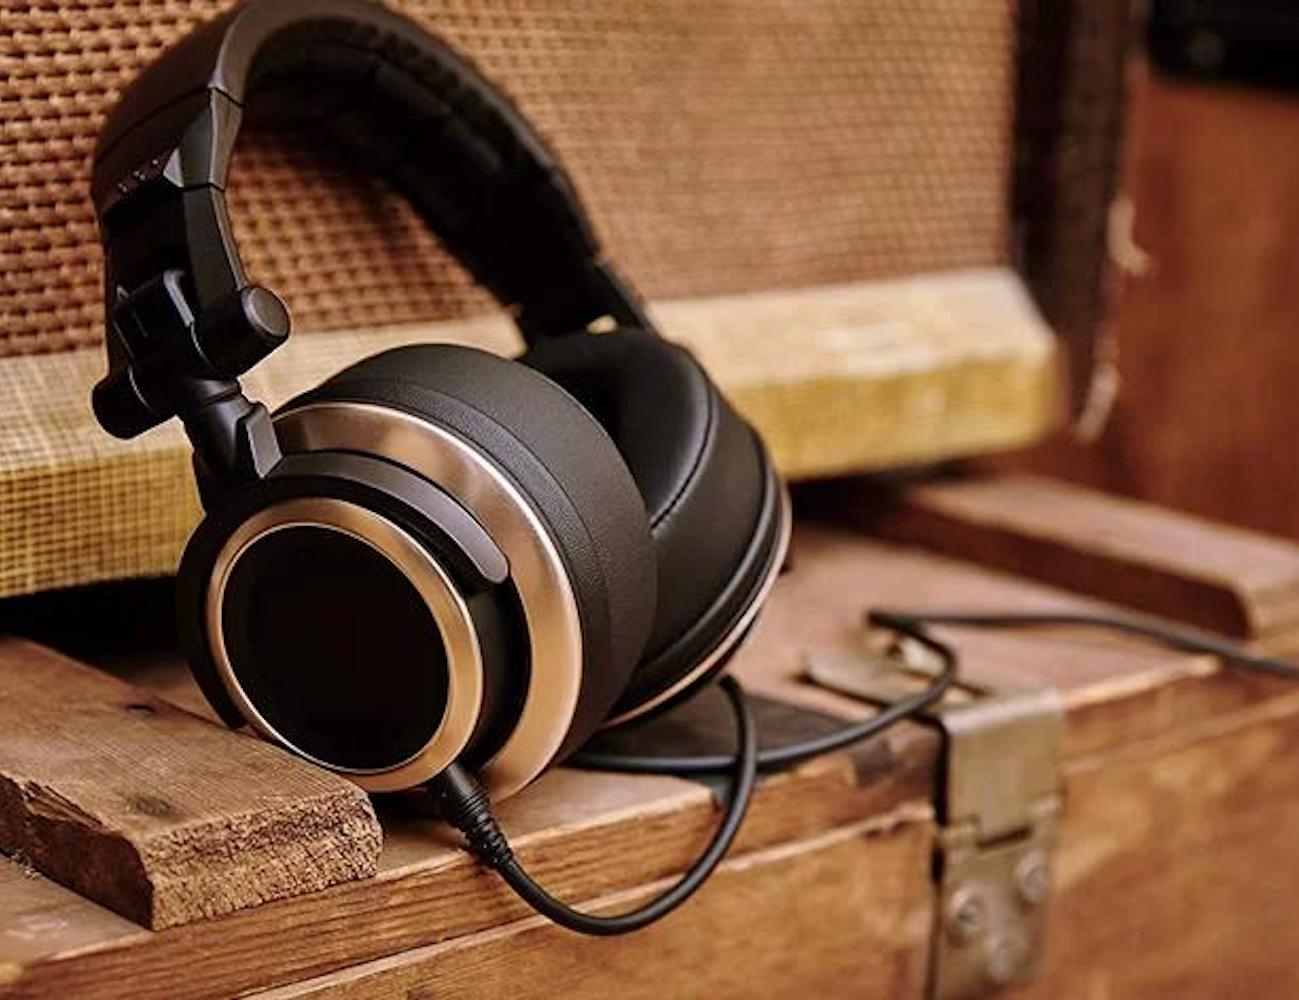 Status Audio CB-1 Professional Studio Headphones provide incredible sound